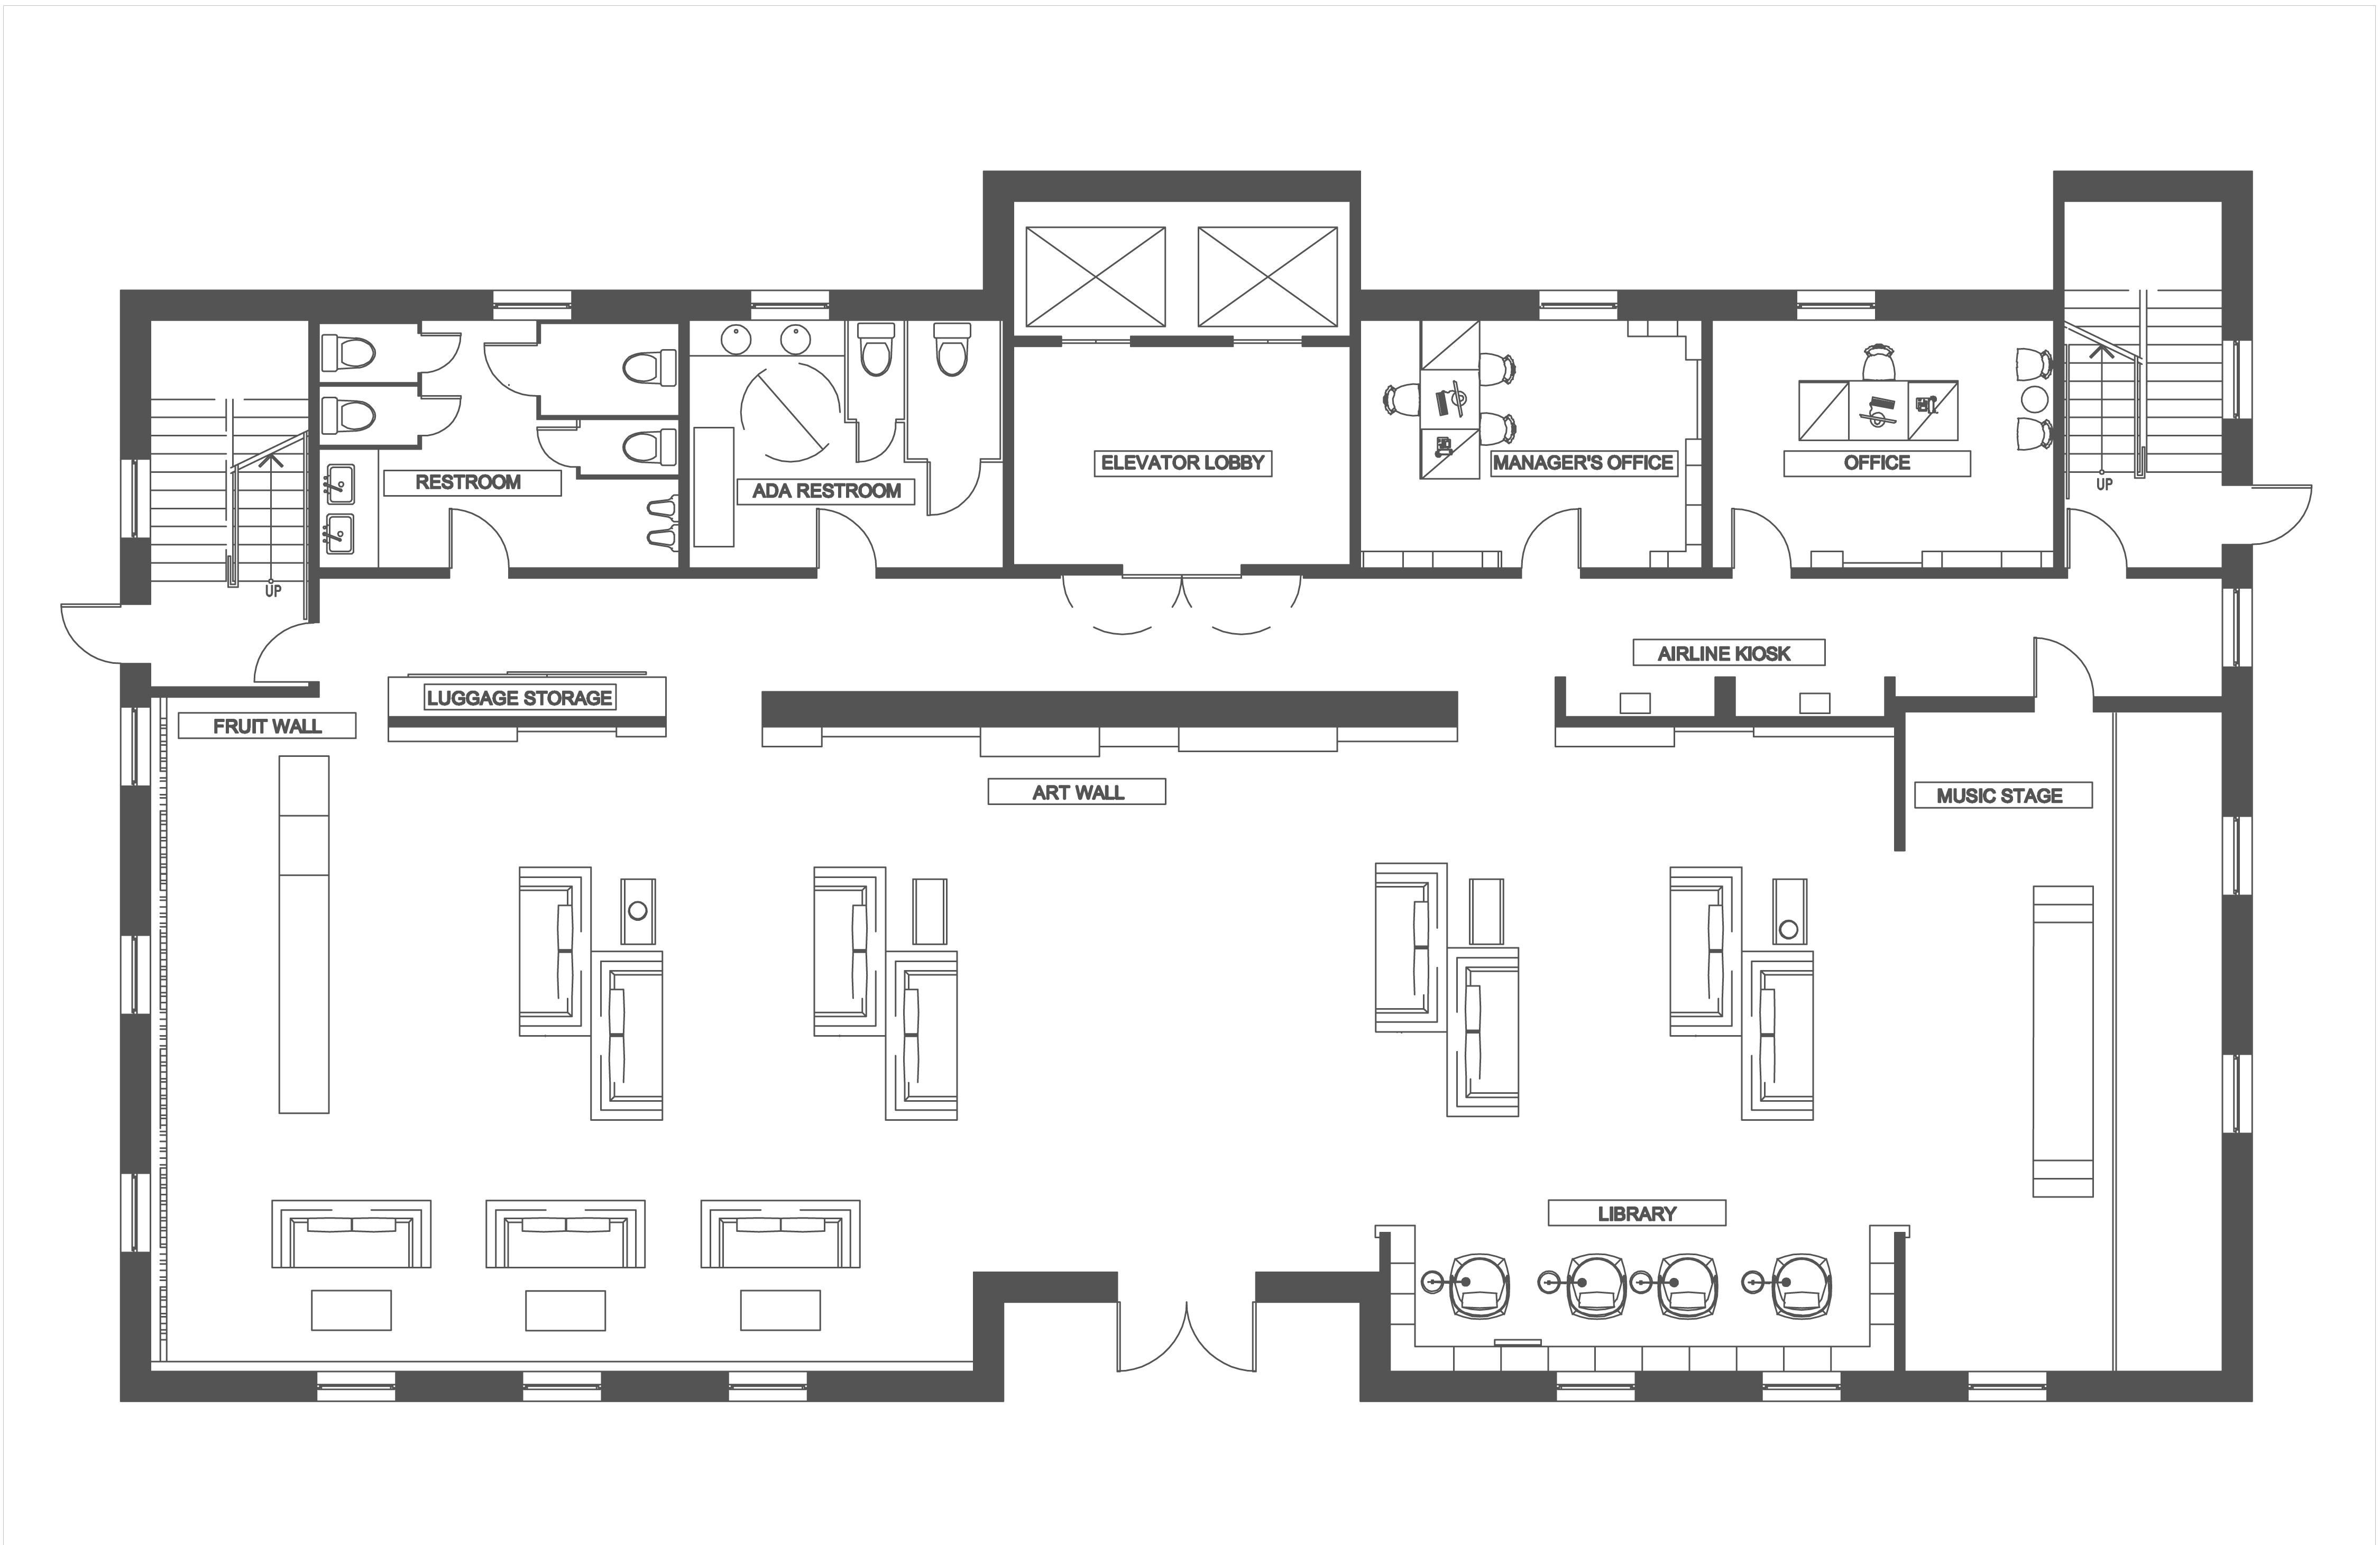 Hotel lobby floor plan - Hotel Lobby